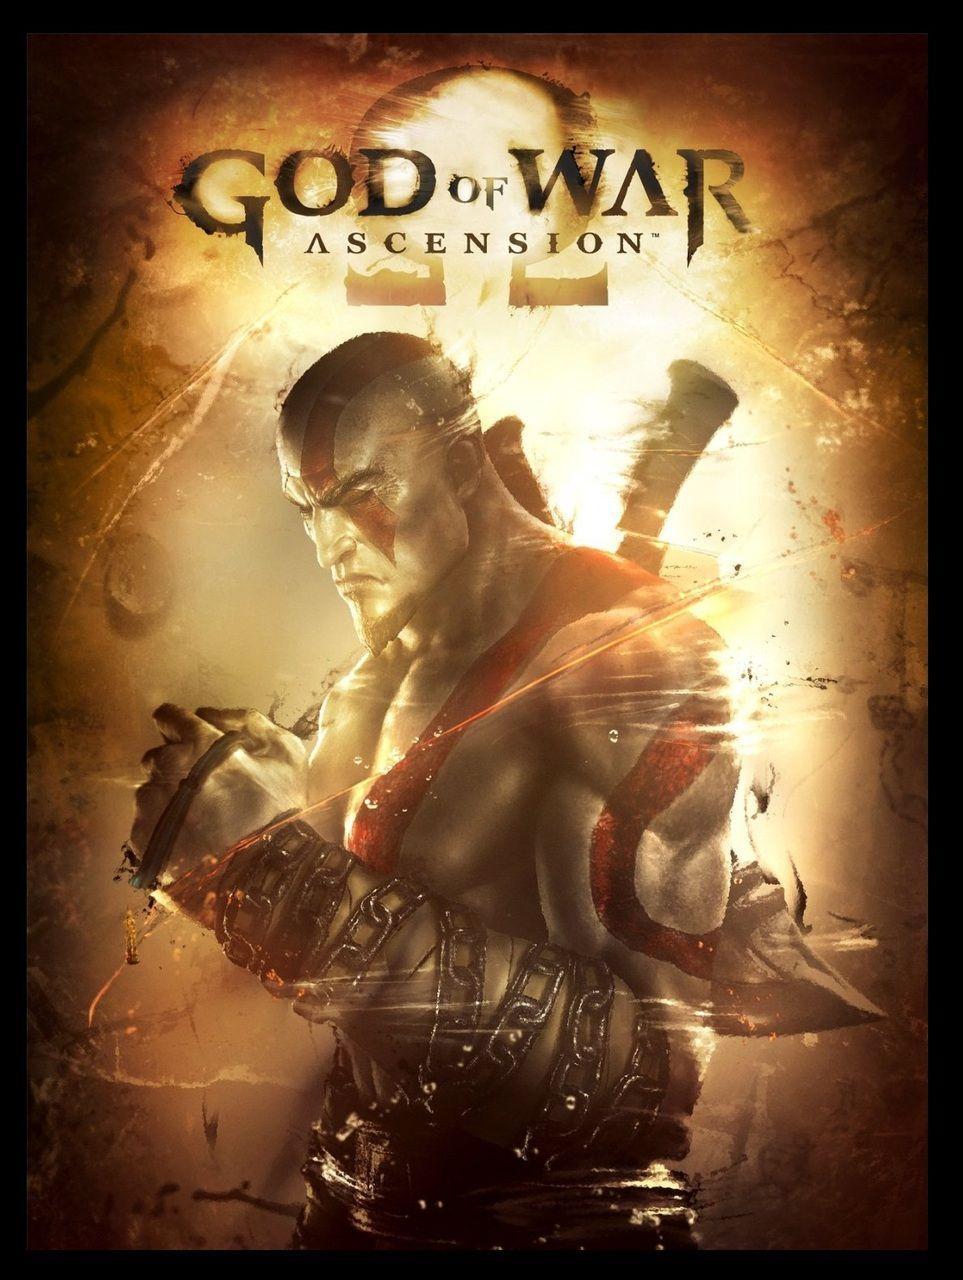 God Of War Ascension Wallpapers Wallpaper Cave